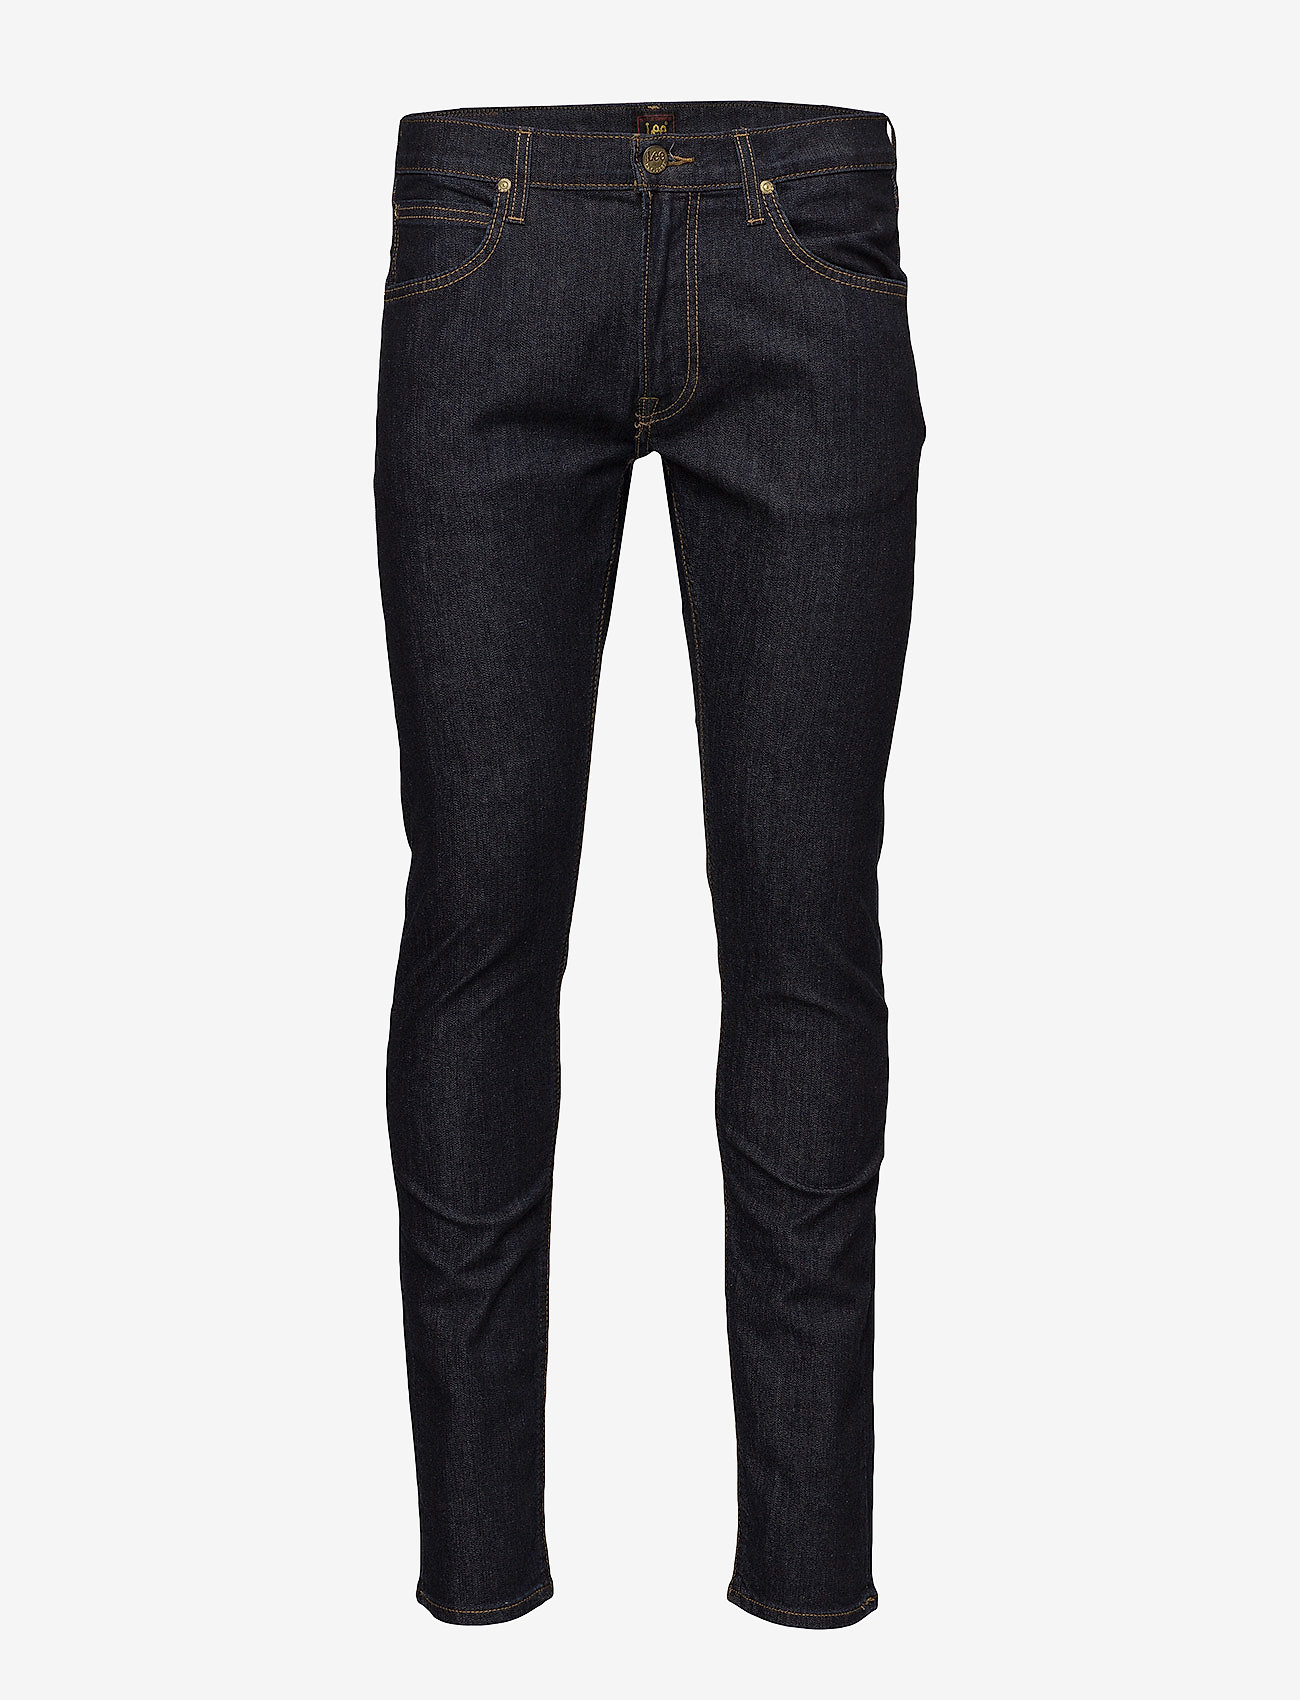 Lee Jeans - LUKE - slim jeans - rinse - 0